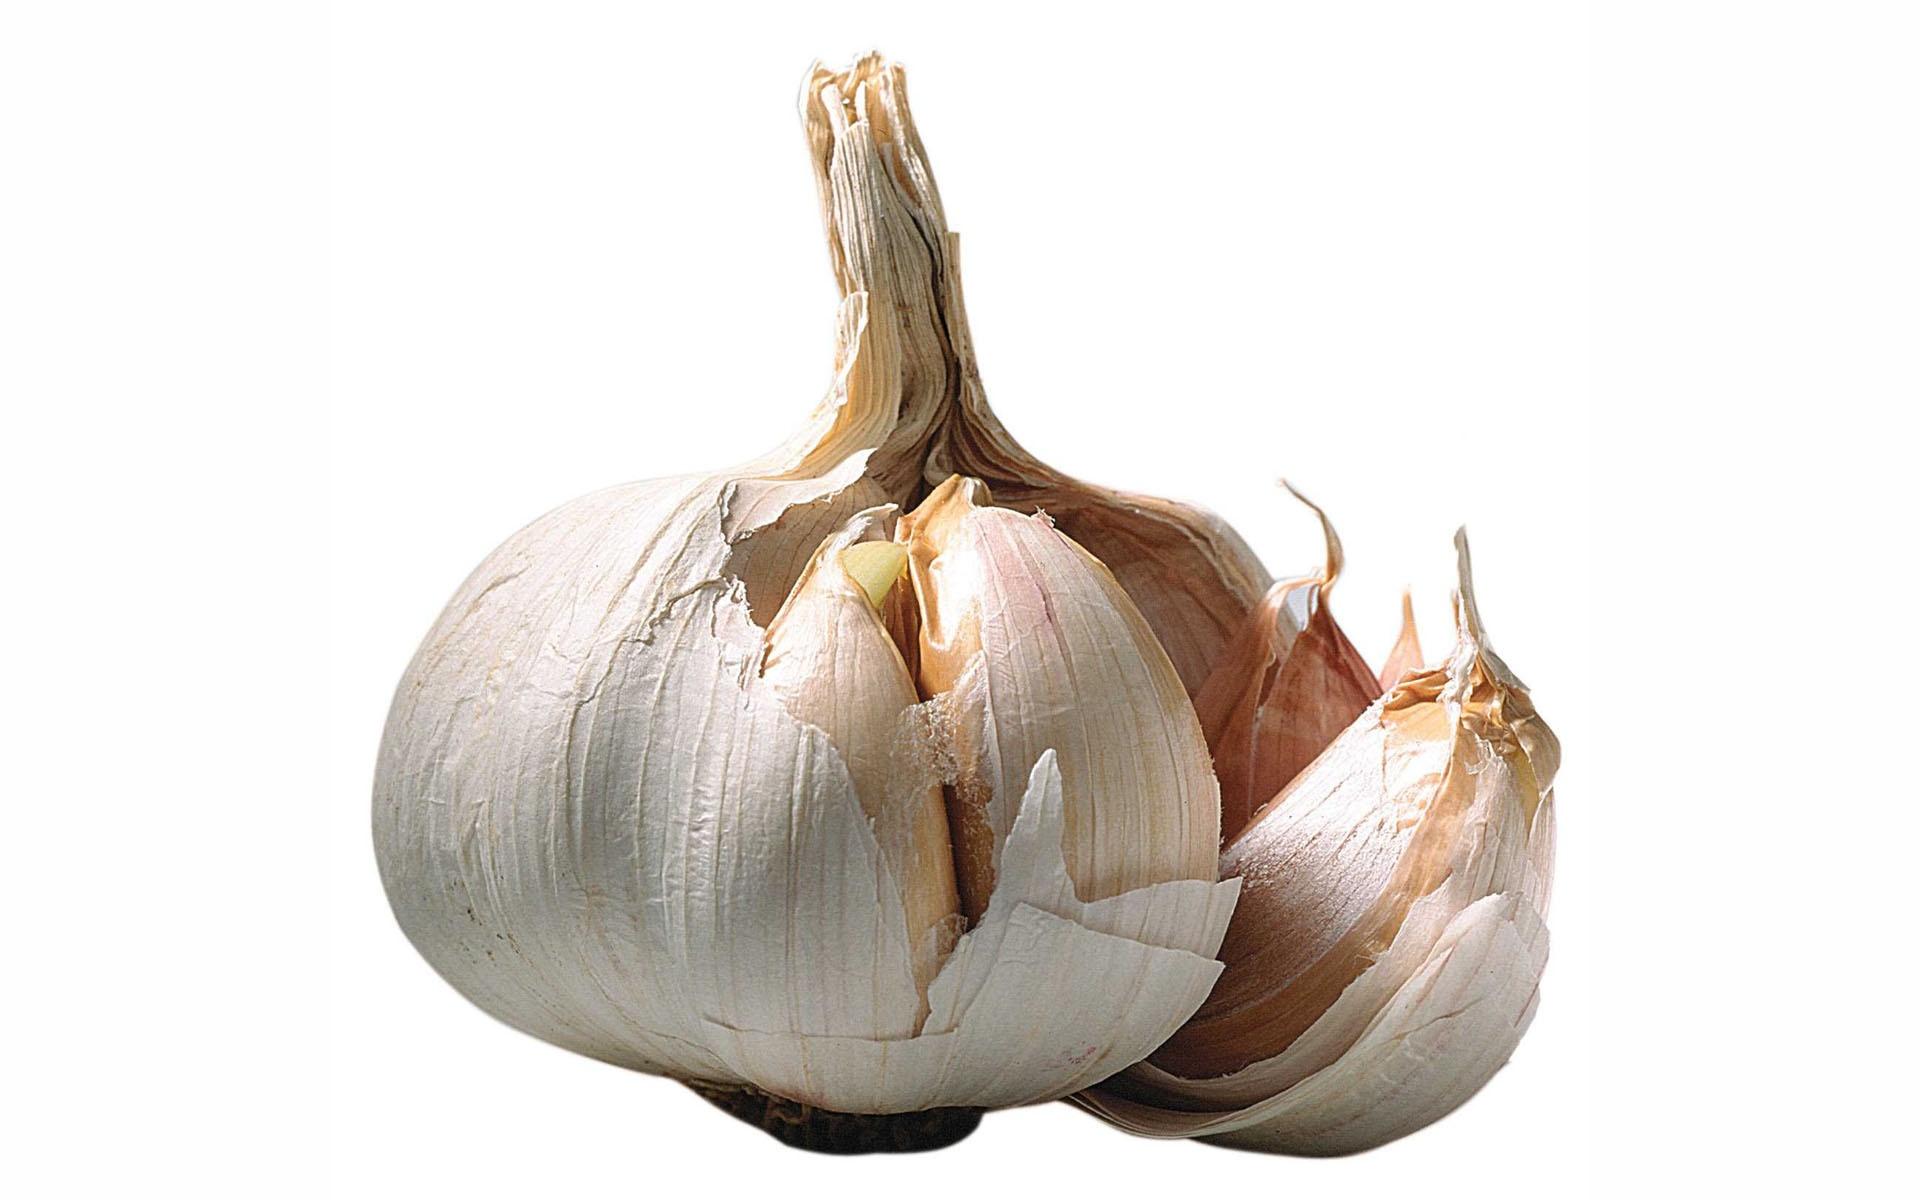 http://dietandi.com/wp-content/uploads/2011/11/Garlic.jpg